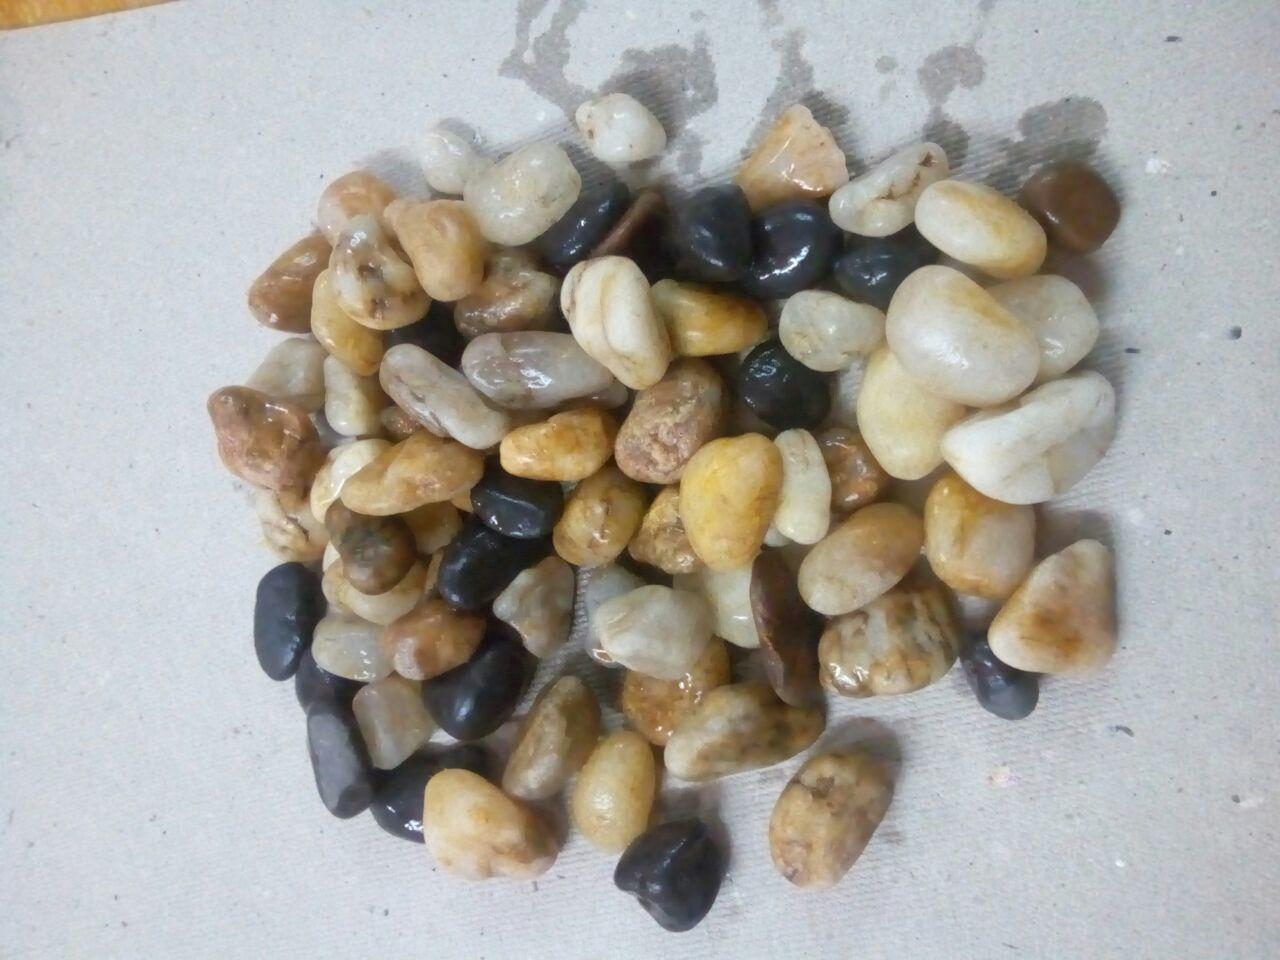 Bulk Wholesale Best Price Garden Decoration Natural River Gravel Pebble Wash Stone